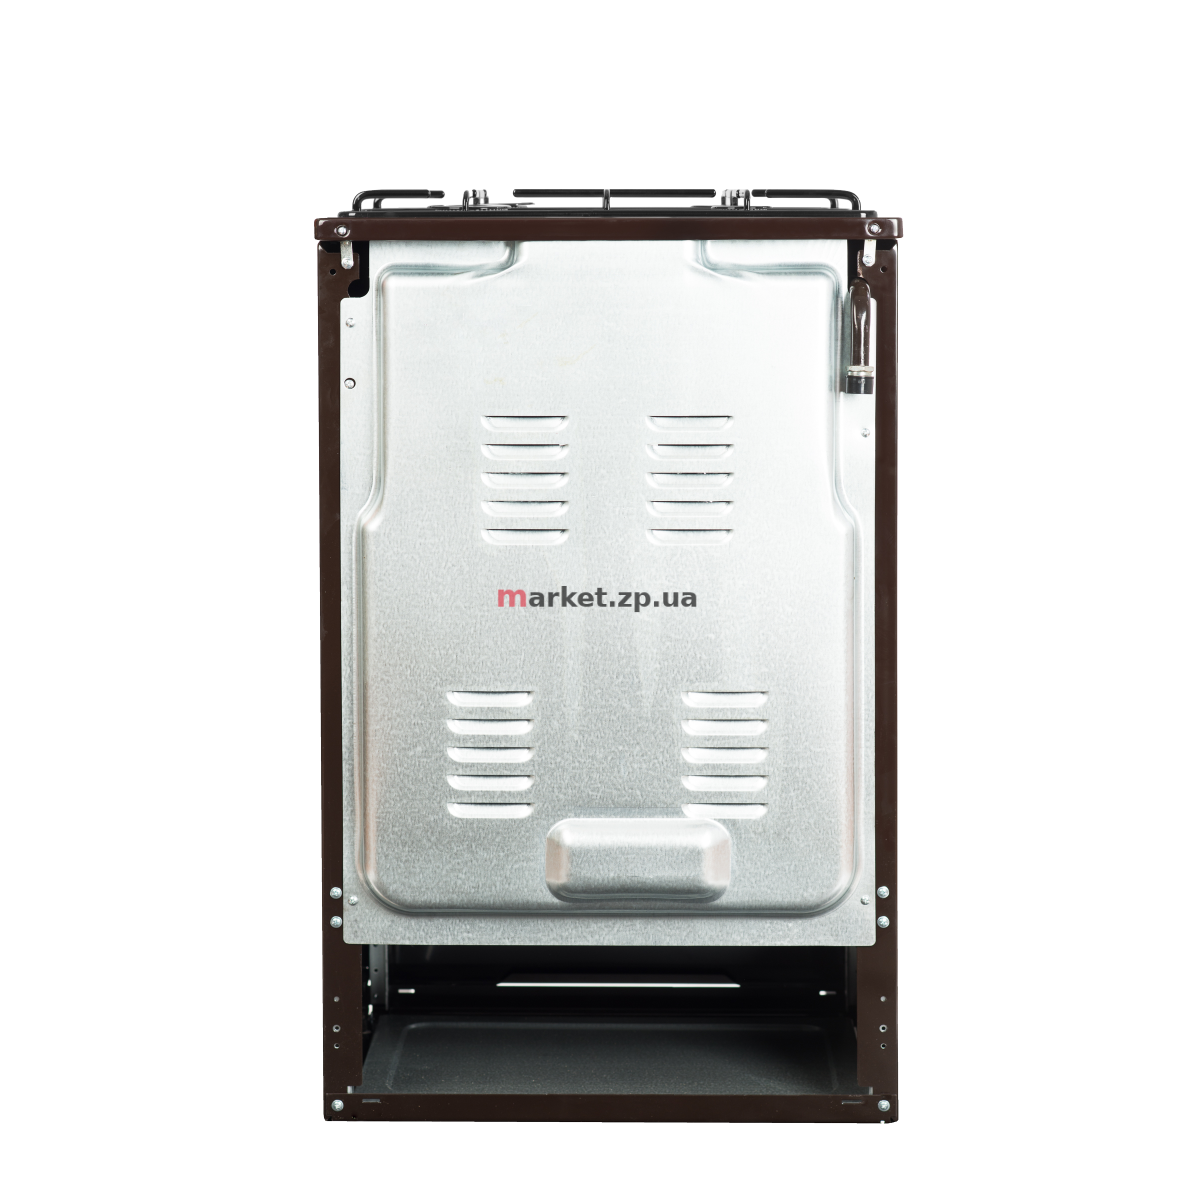 Плита газовая GRETA 1470-20 аа (B) Газ-контроль